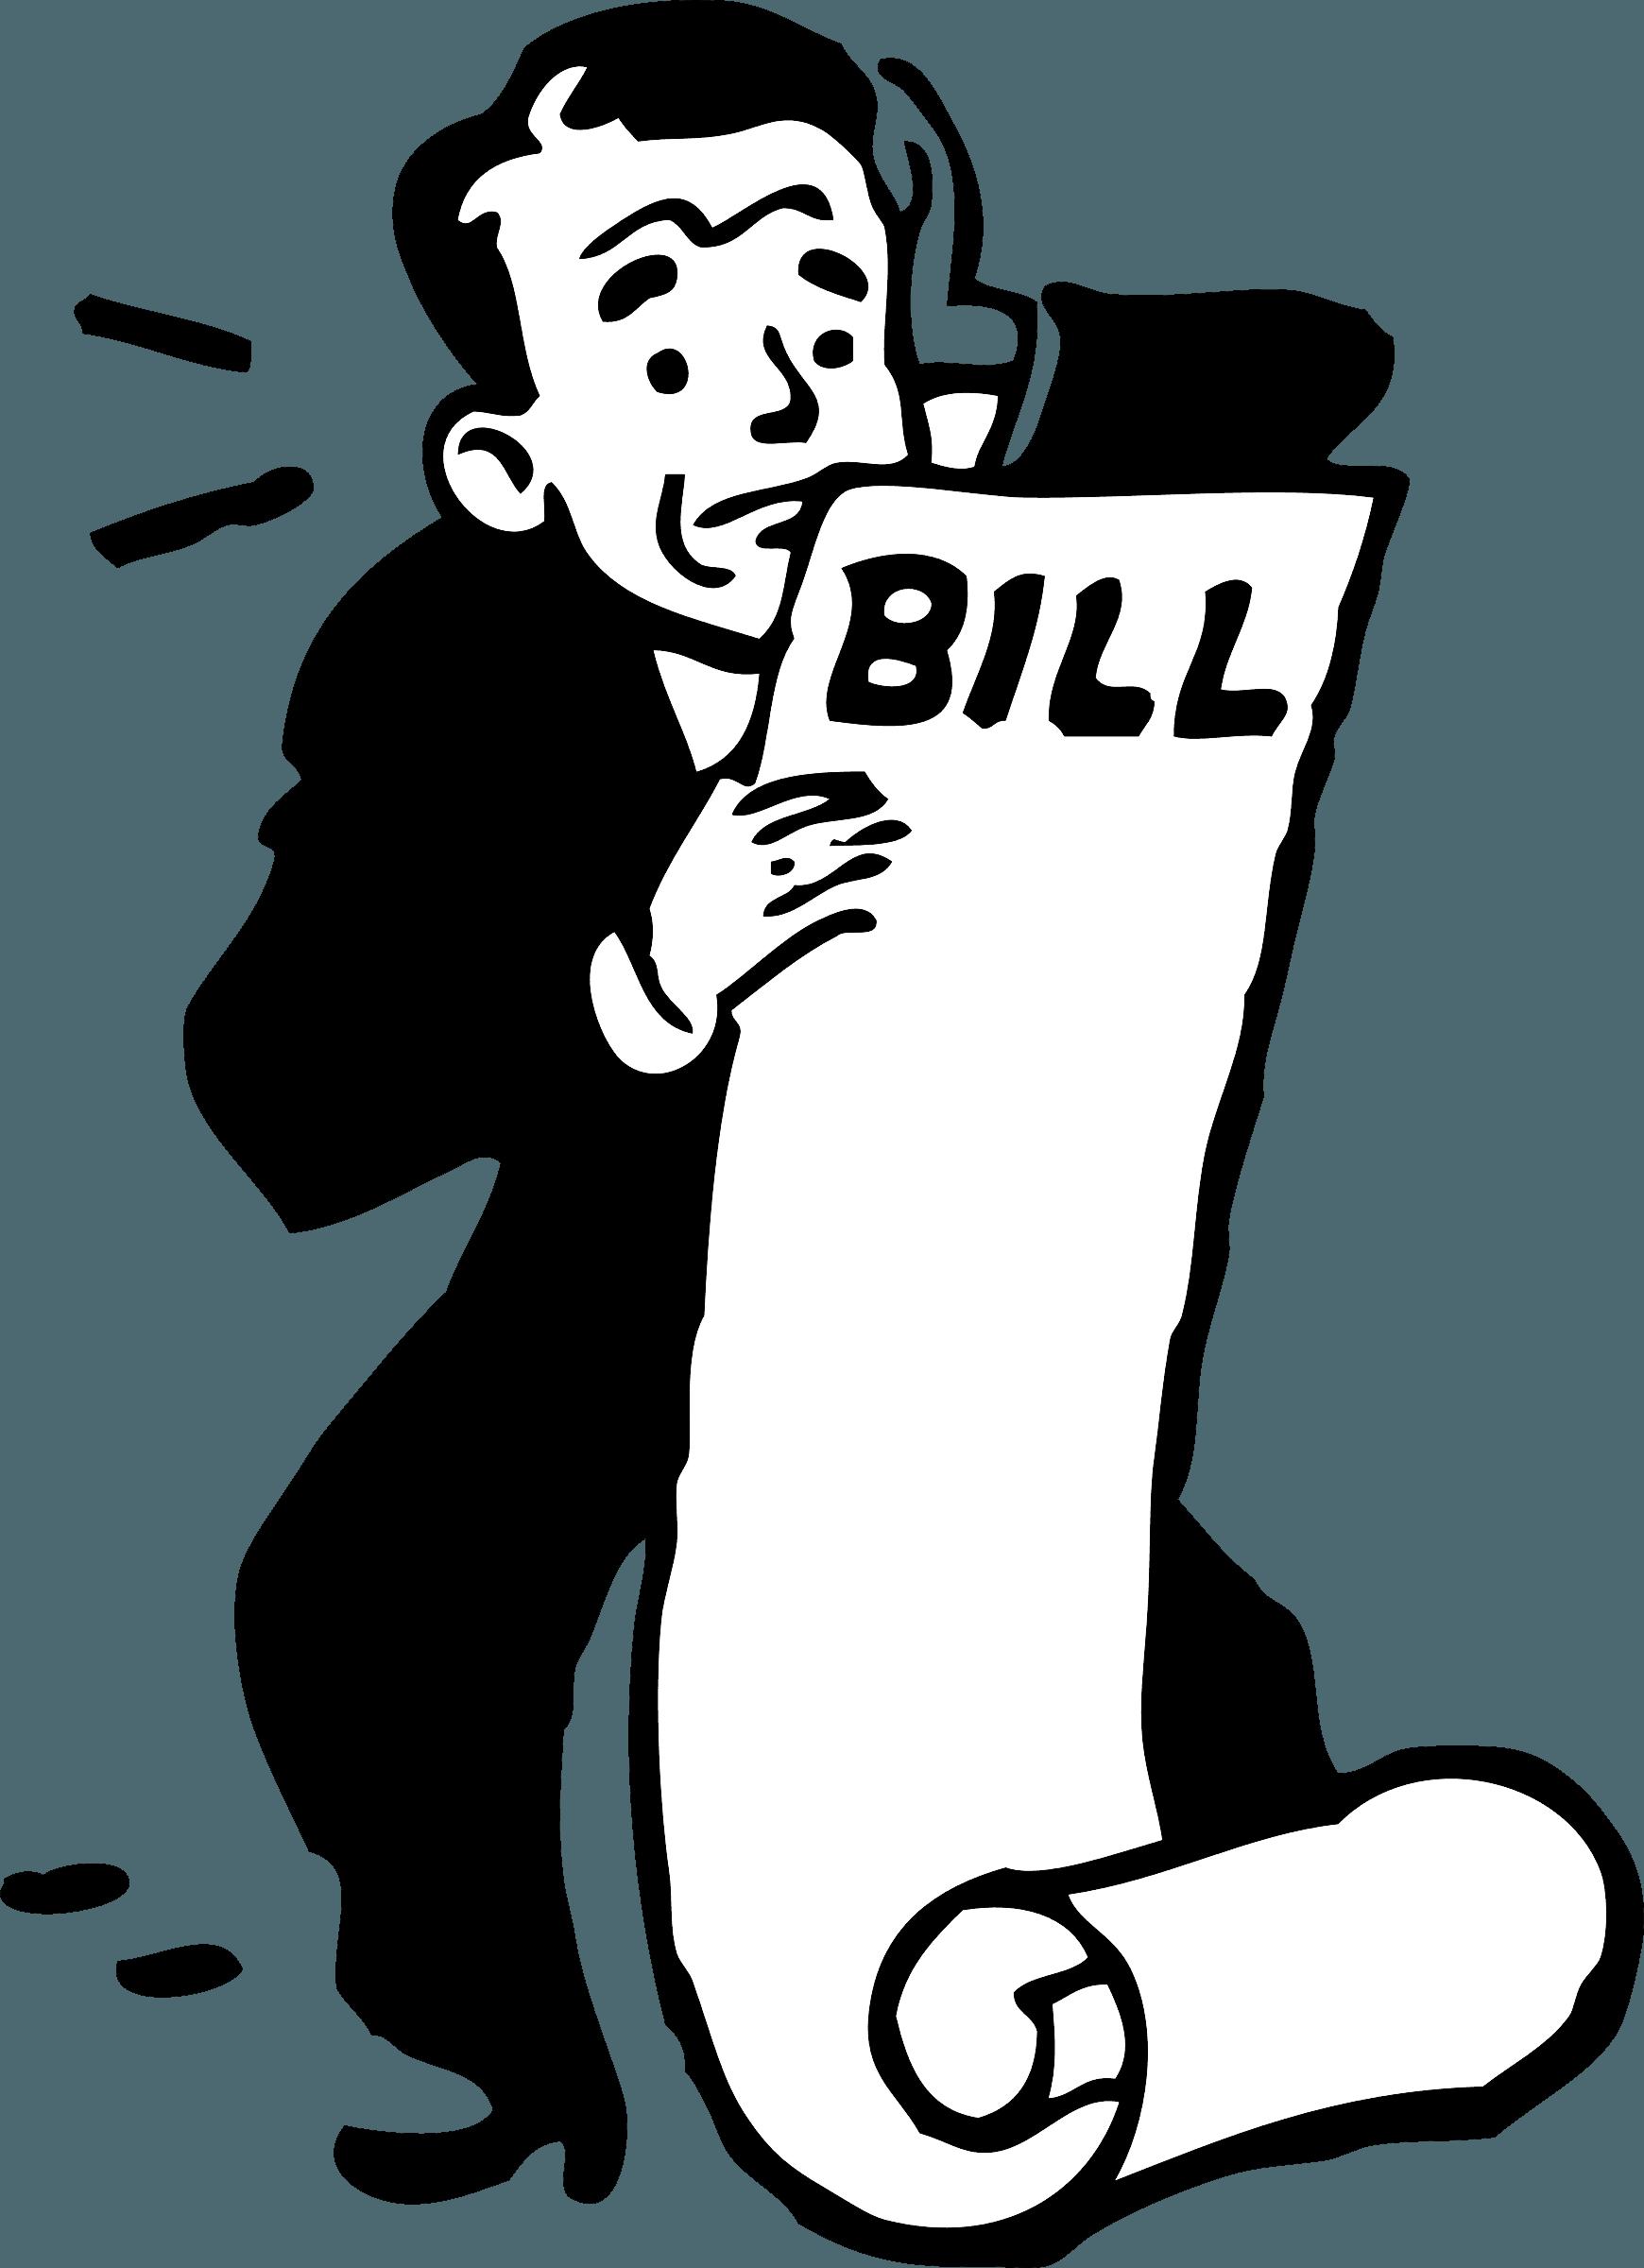 Bills clipart hospital bill. Priorities christmas has come